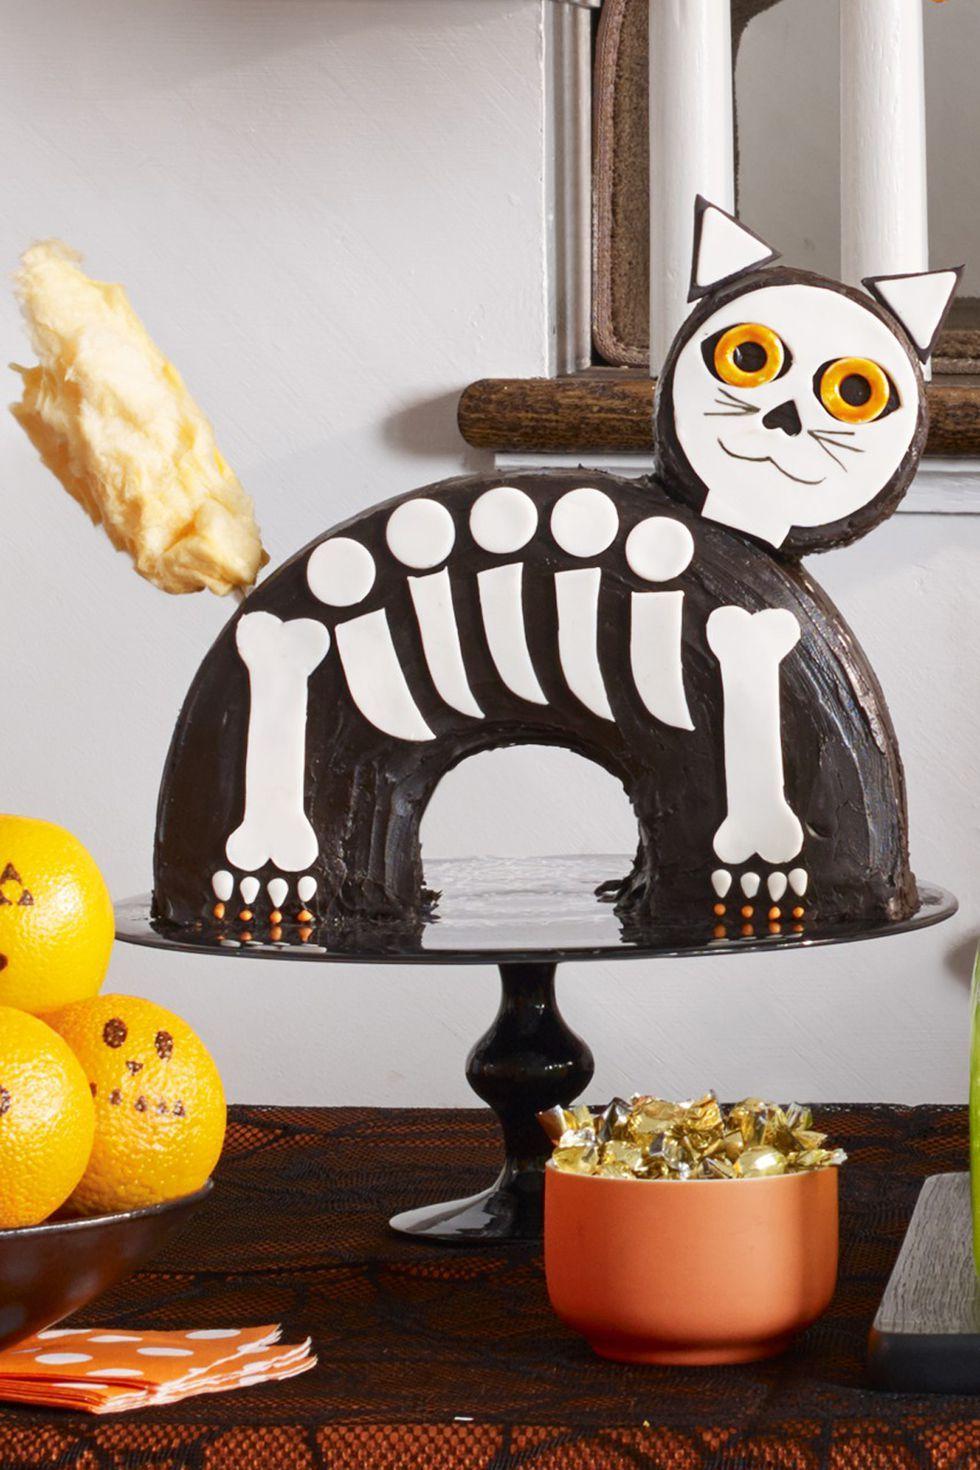 46 Easy Halloween Party Ideas \u2014 DIY Halloween Party Ideas